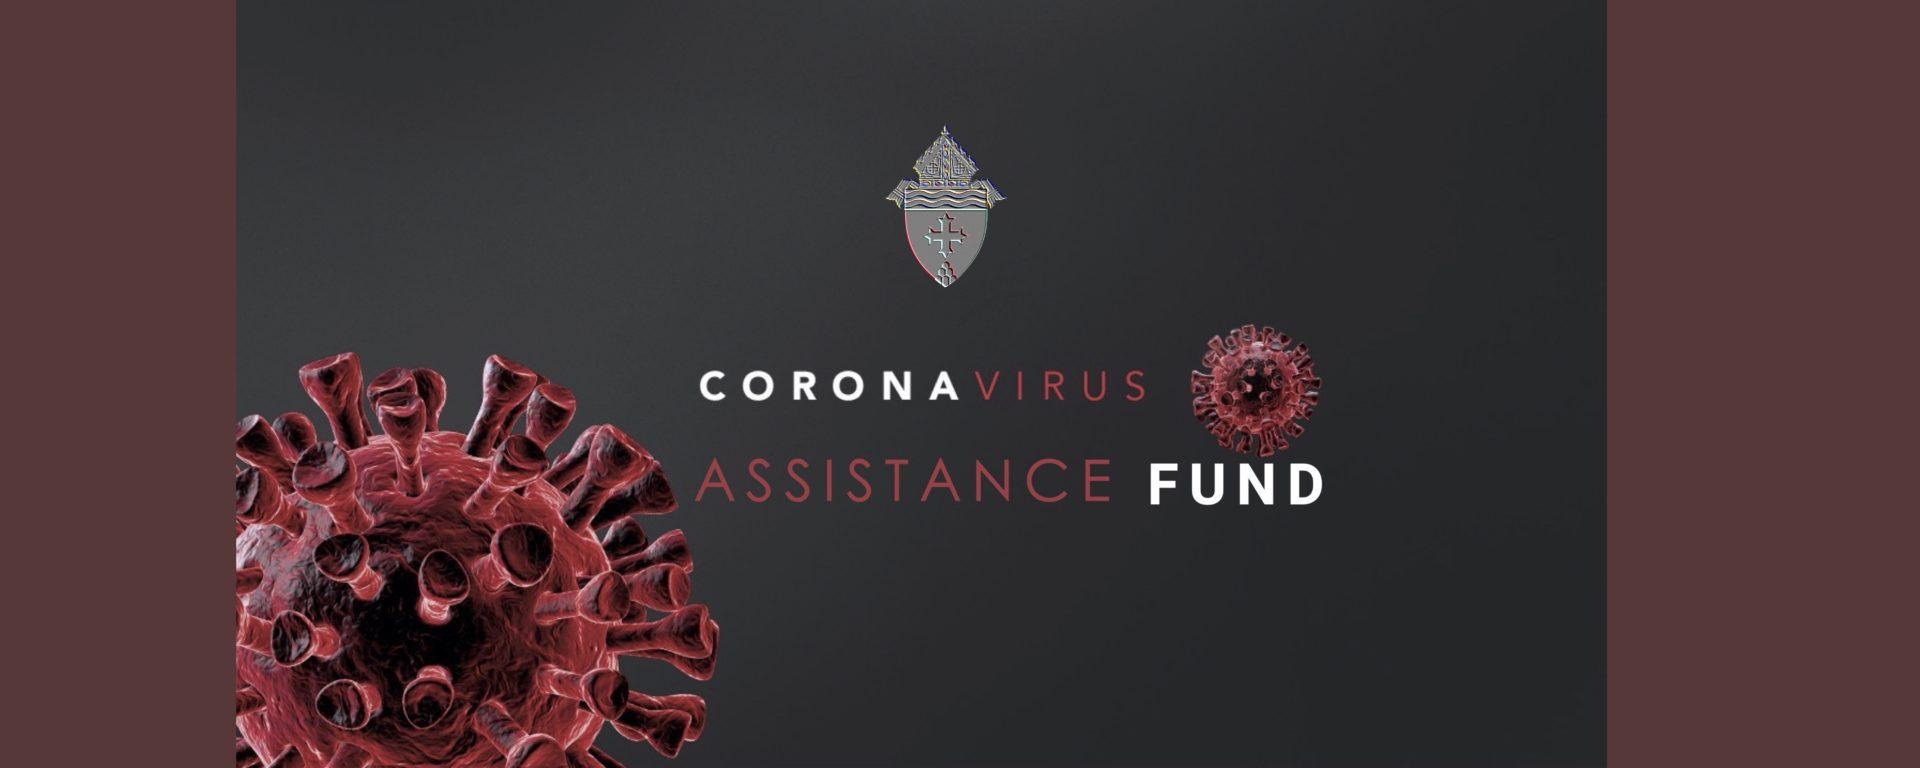 coronavirus assistance fund